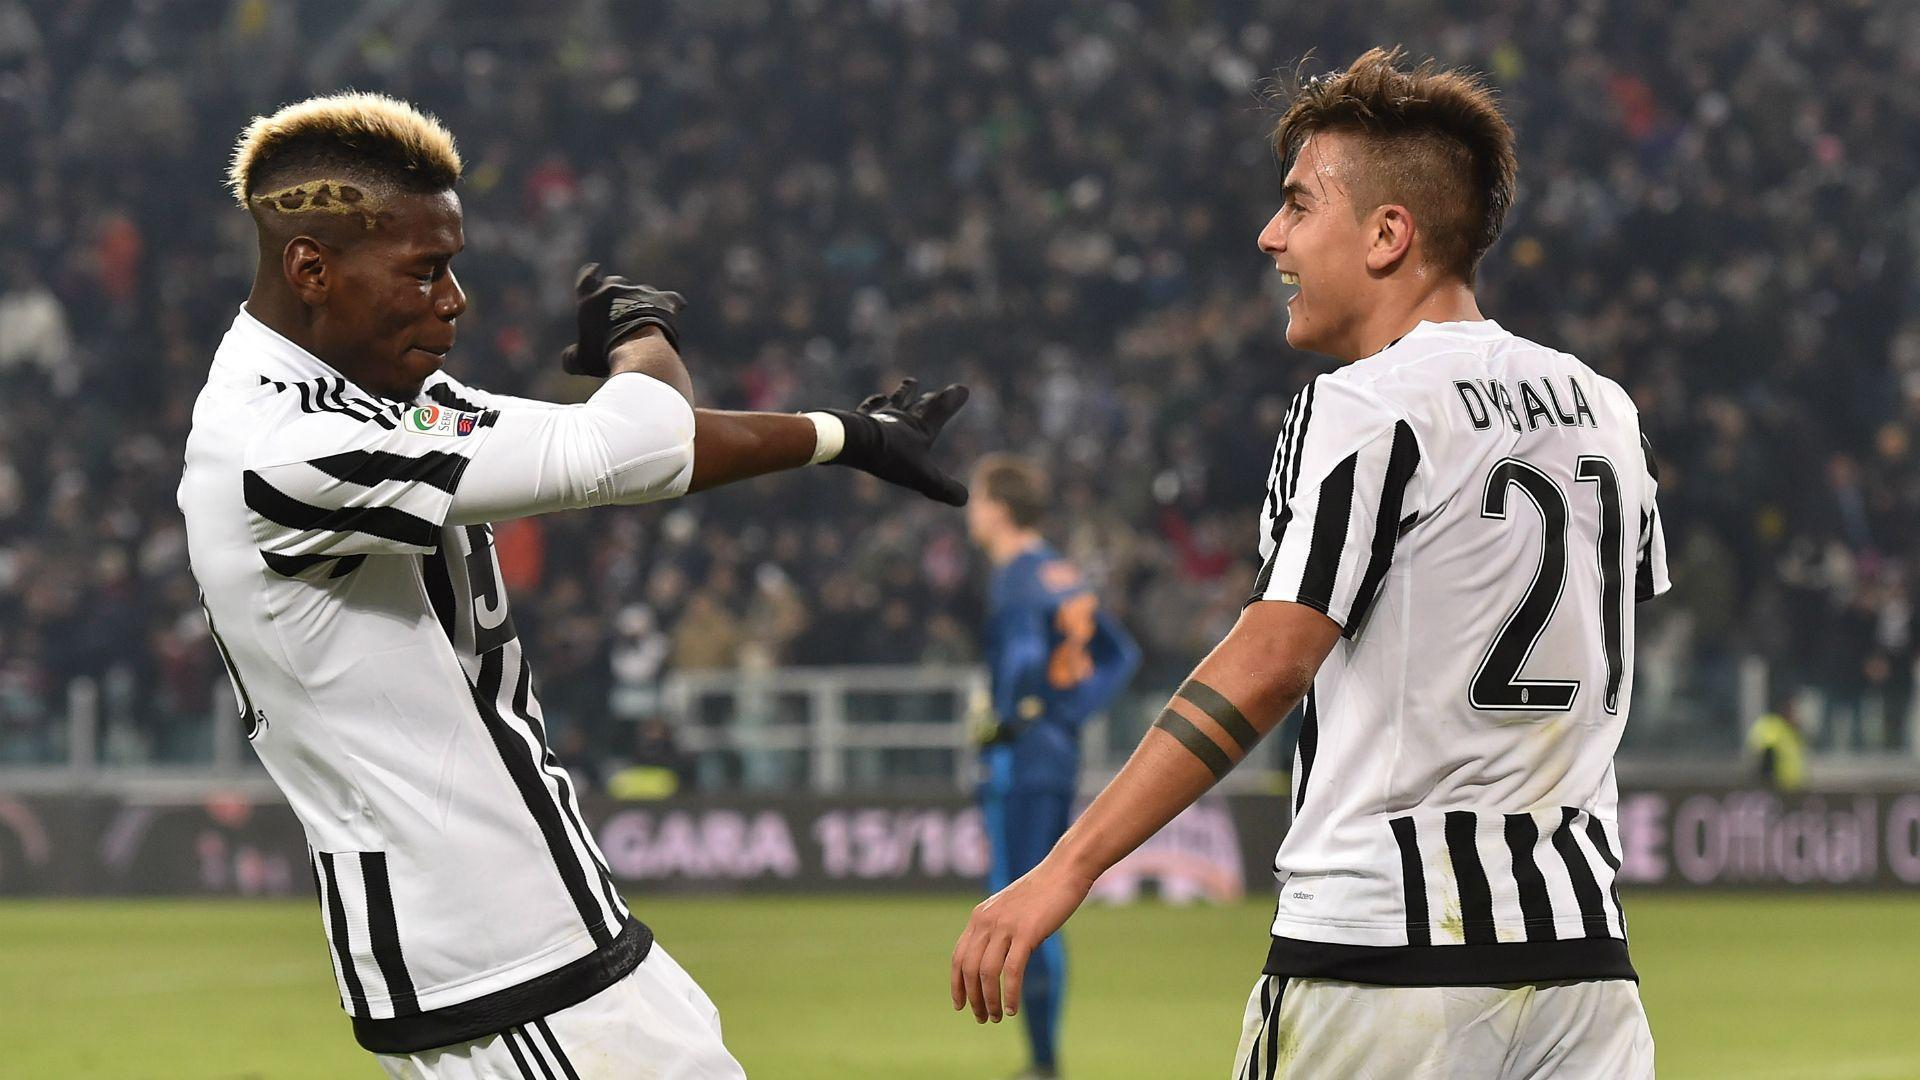 Football | Juventus news: Dybala not getting carried away | SPORTAL